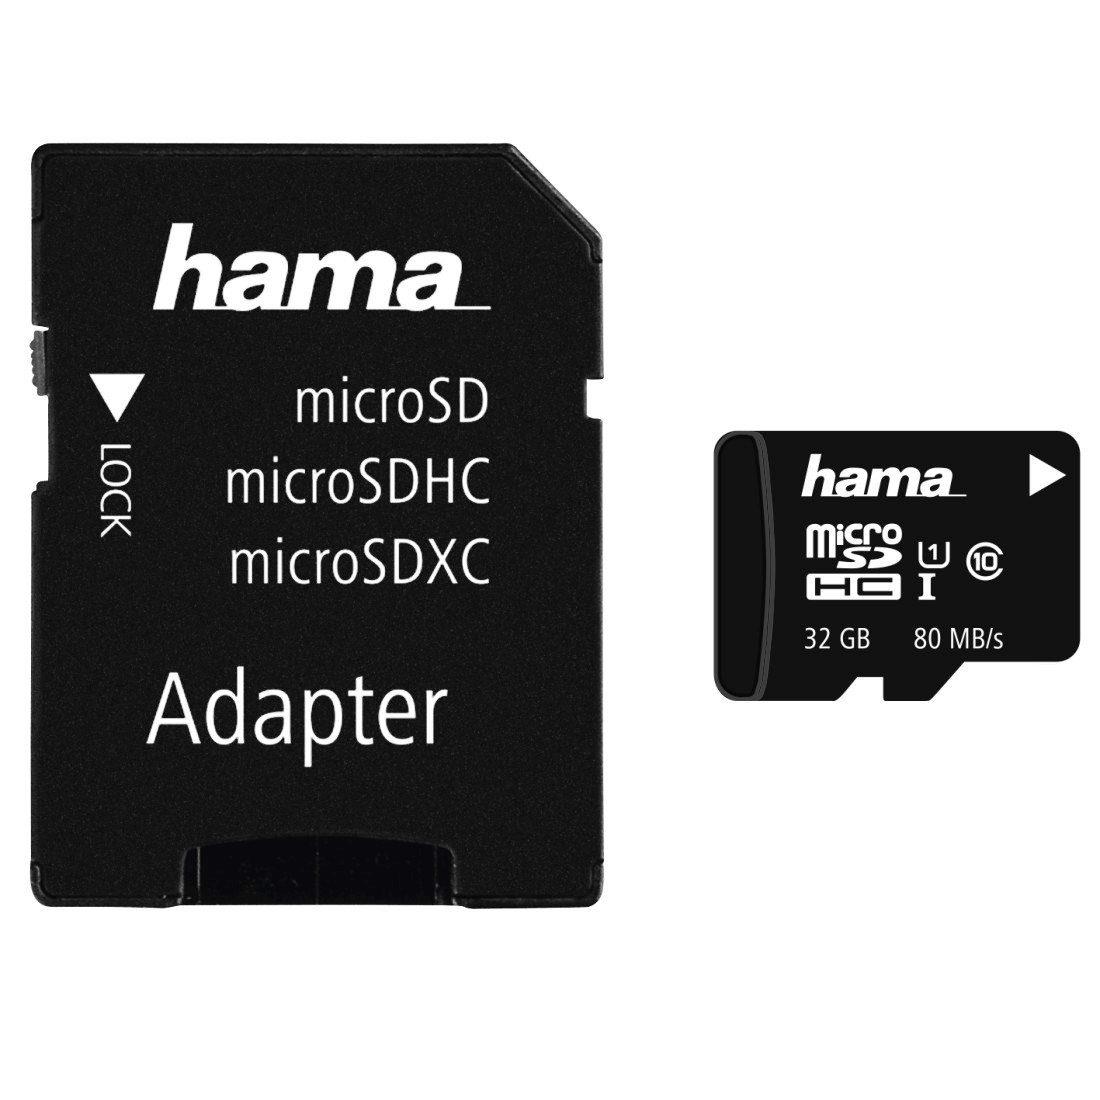 Hama Speicherkarte microSDHC 32GB Class 10 UHS-I 80MB/s »inkl. Adapter auf SD Karte«